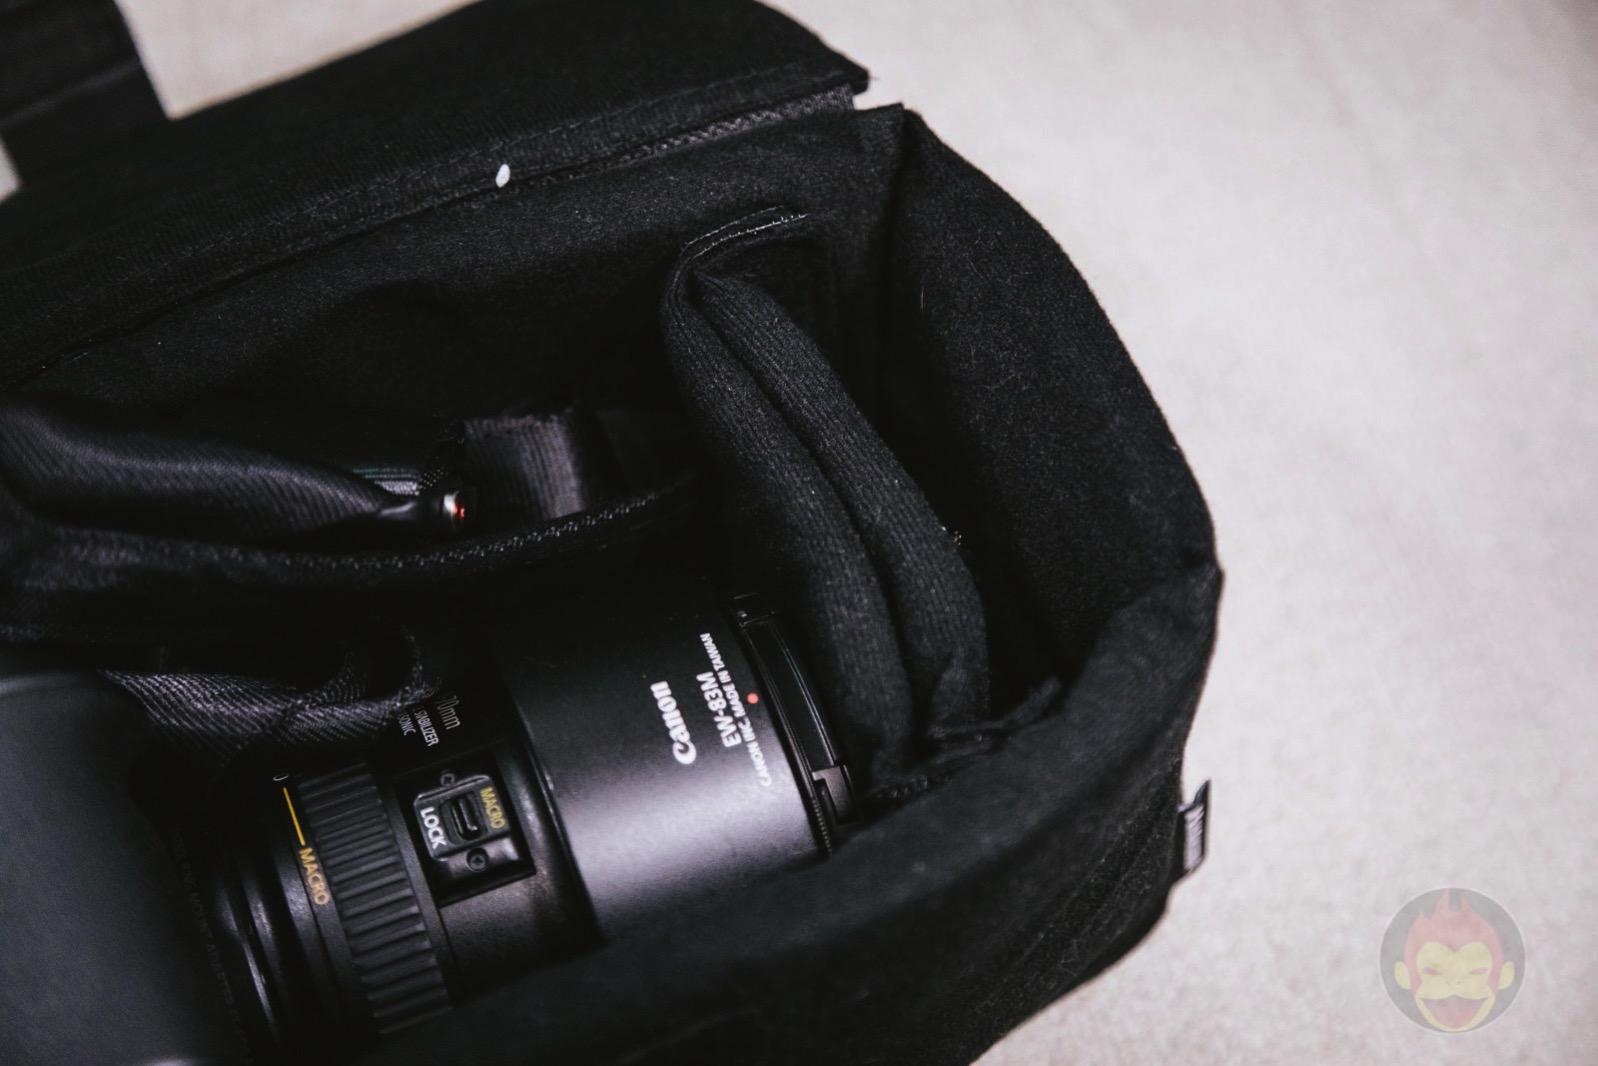 Hakuba-Camerabag-Innerbox-Review-04.jpg